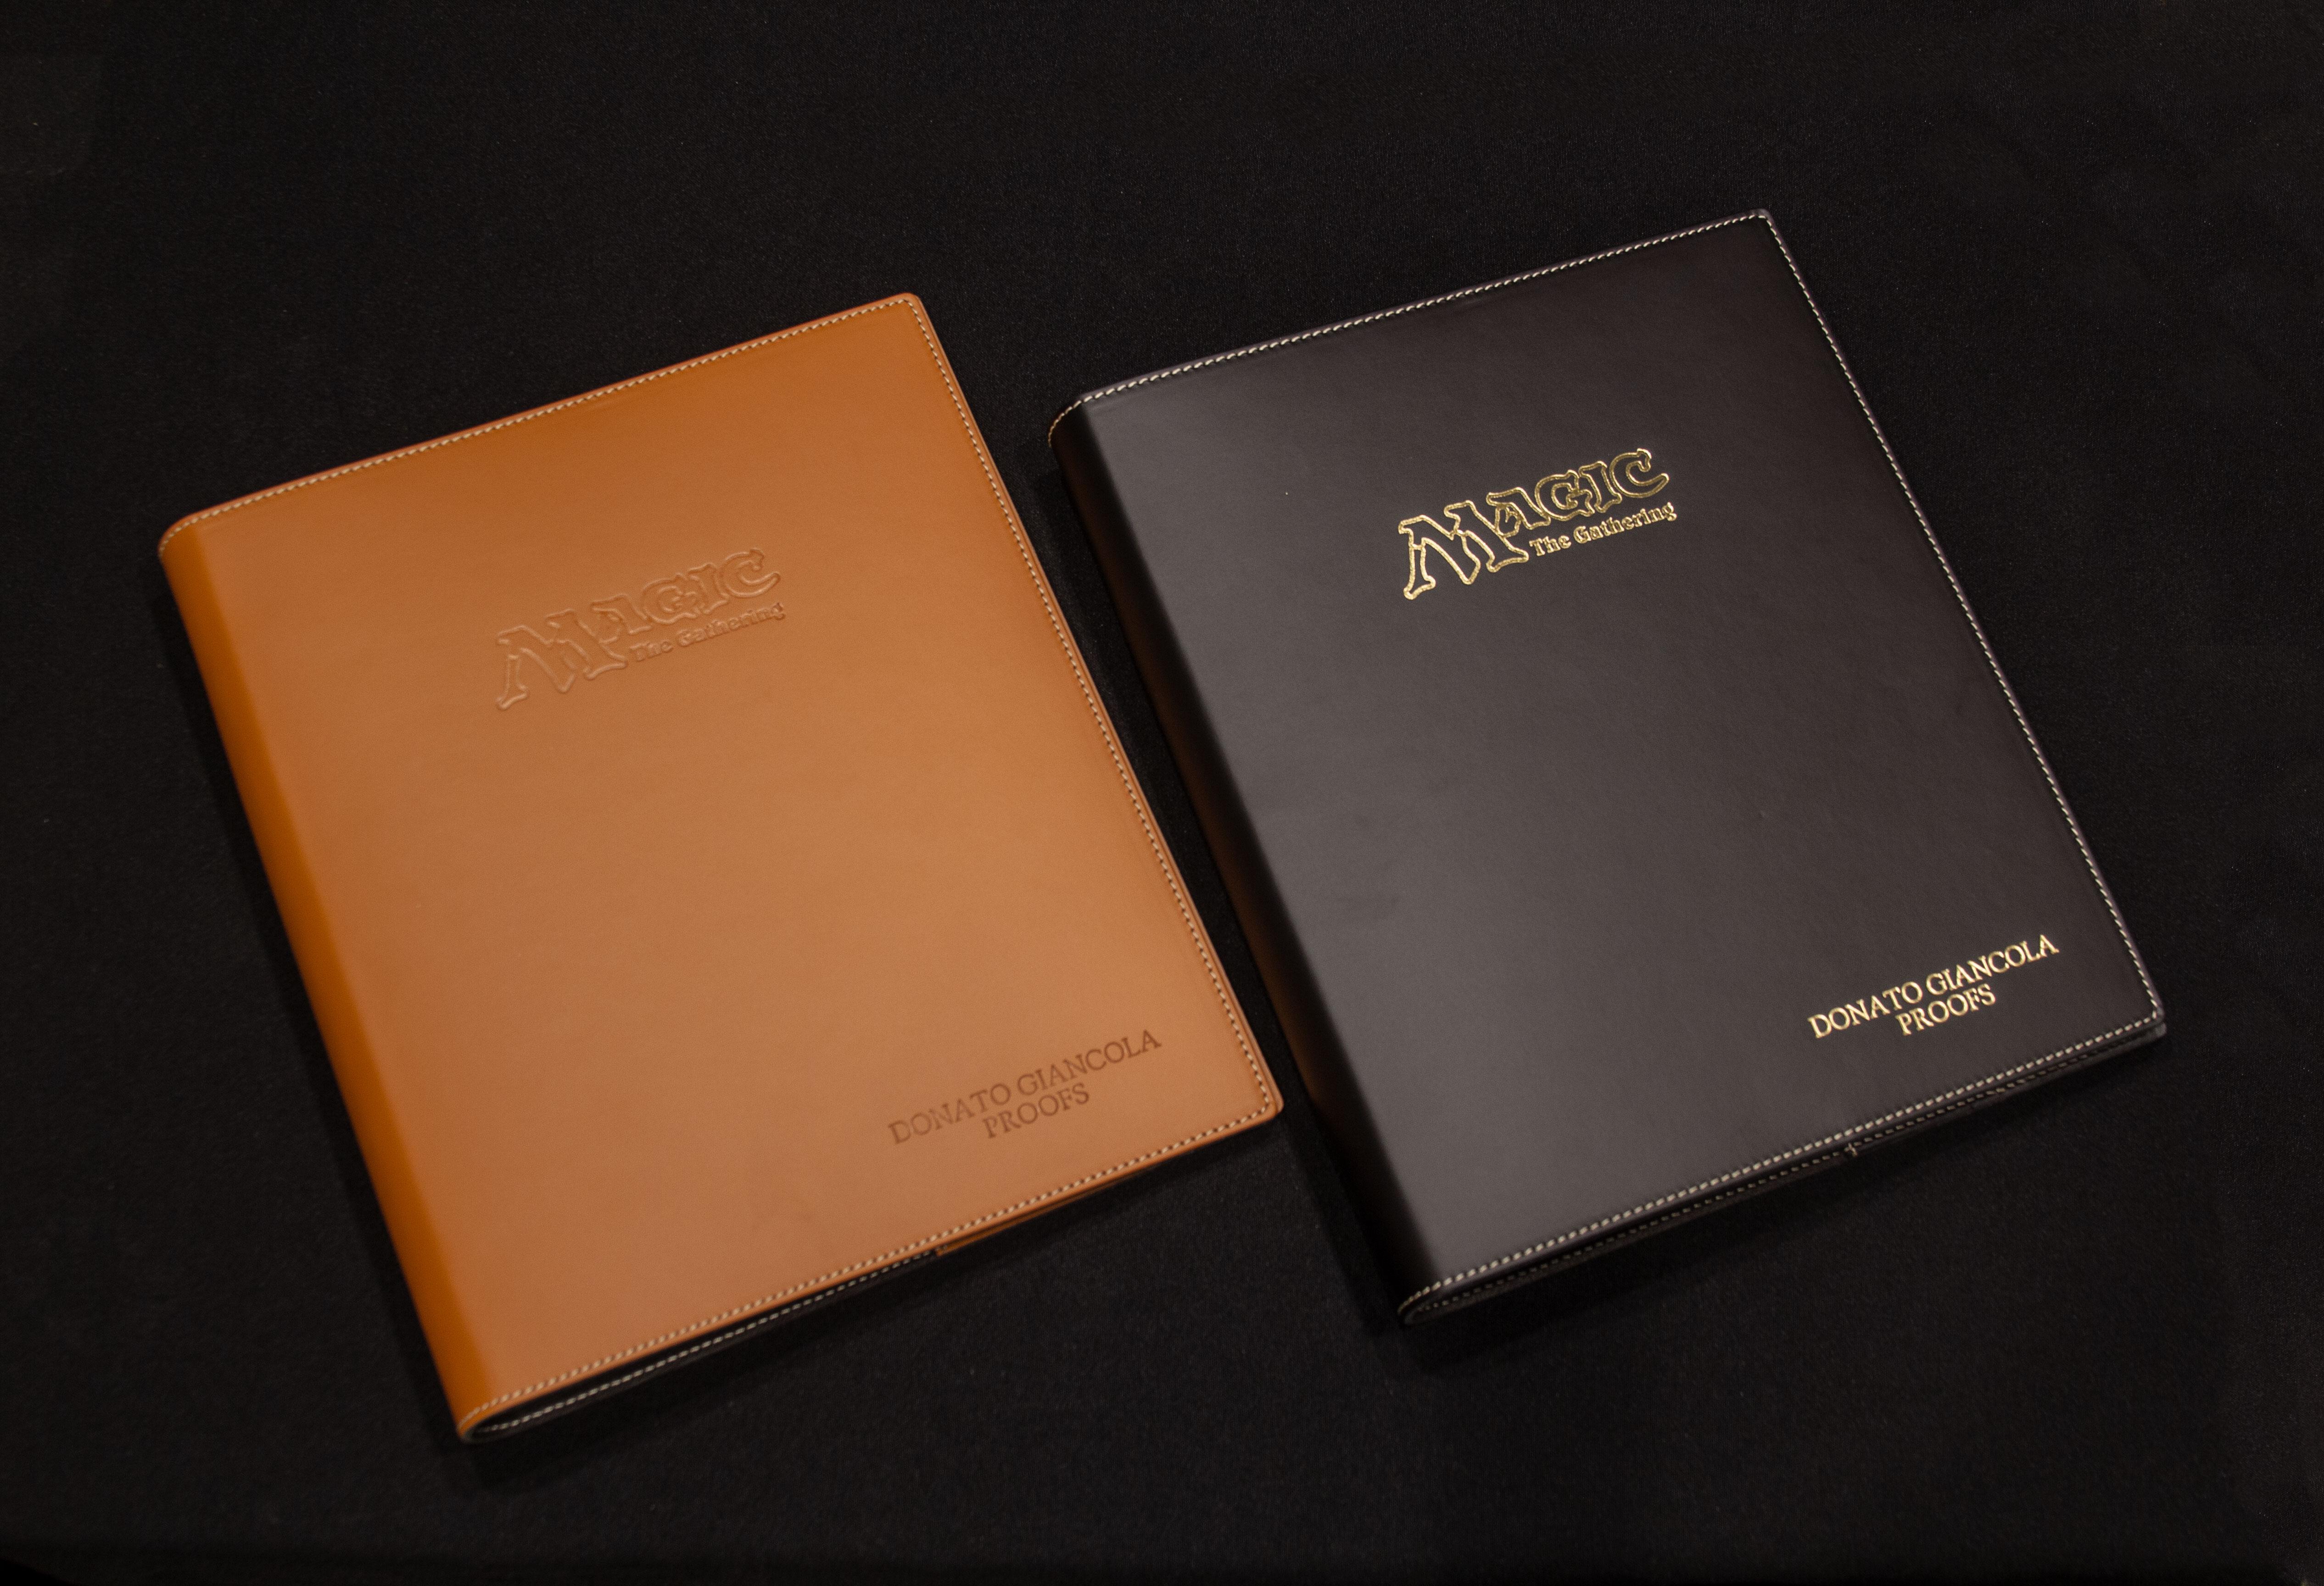 Embossed Italian Leather binder - option tan or black